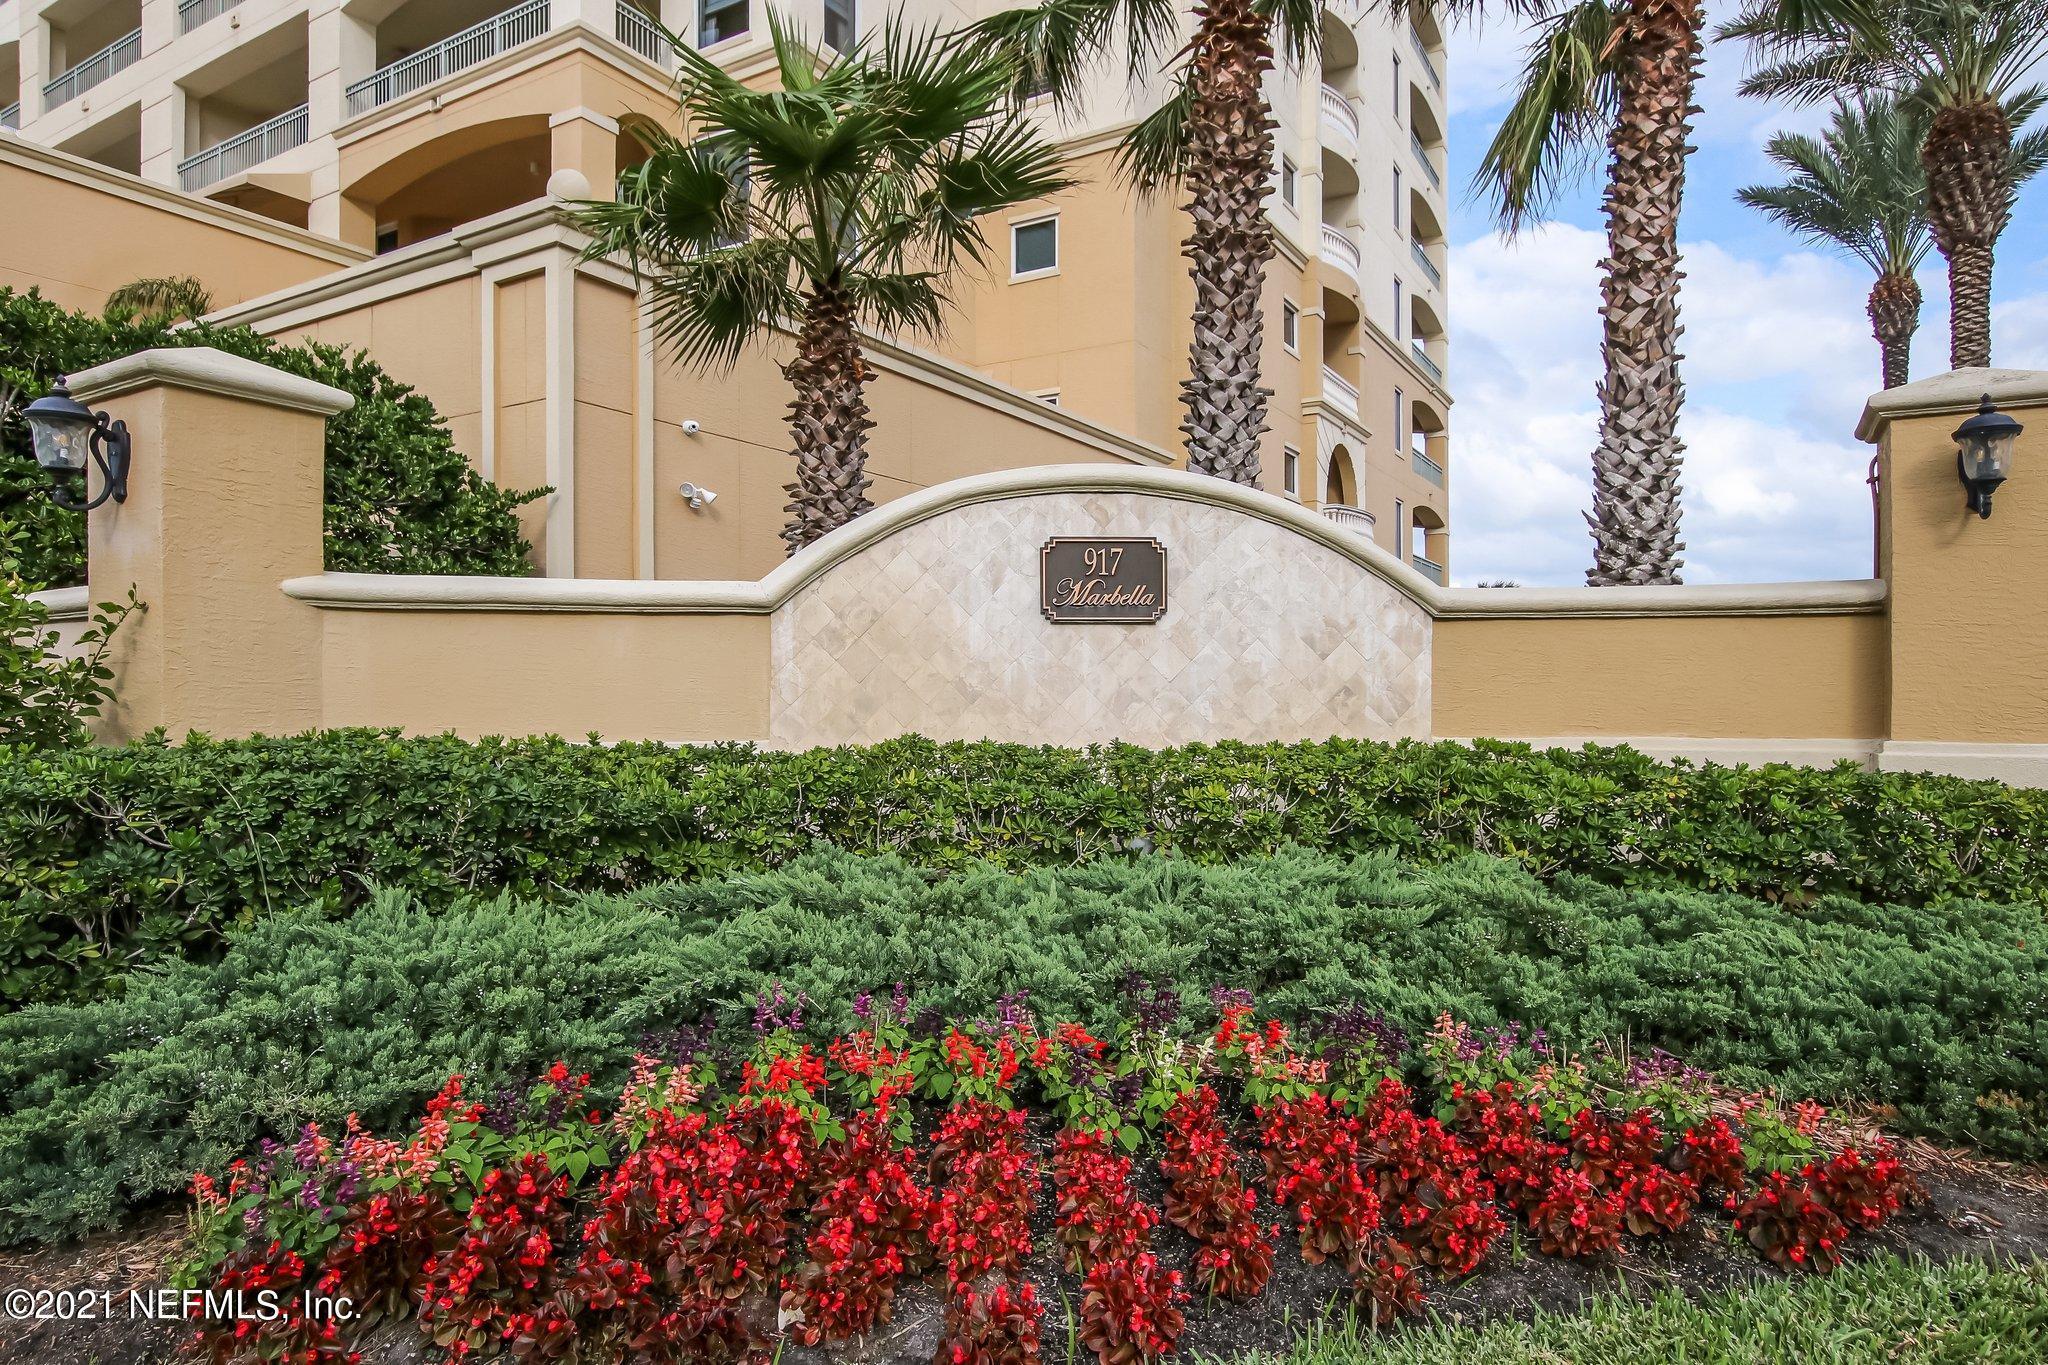 917 1ST, JACKSONVILLE BEACH, FLORIDA 32250, 4 Bedrooms Bedrooms, ,4 BathroomsBathrooms,Residential,For sale,1ST,1123791